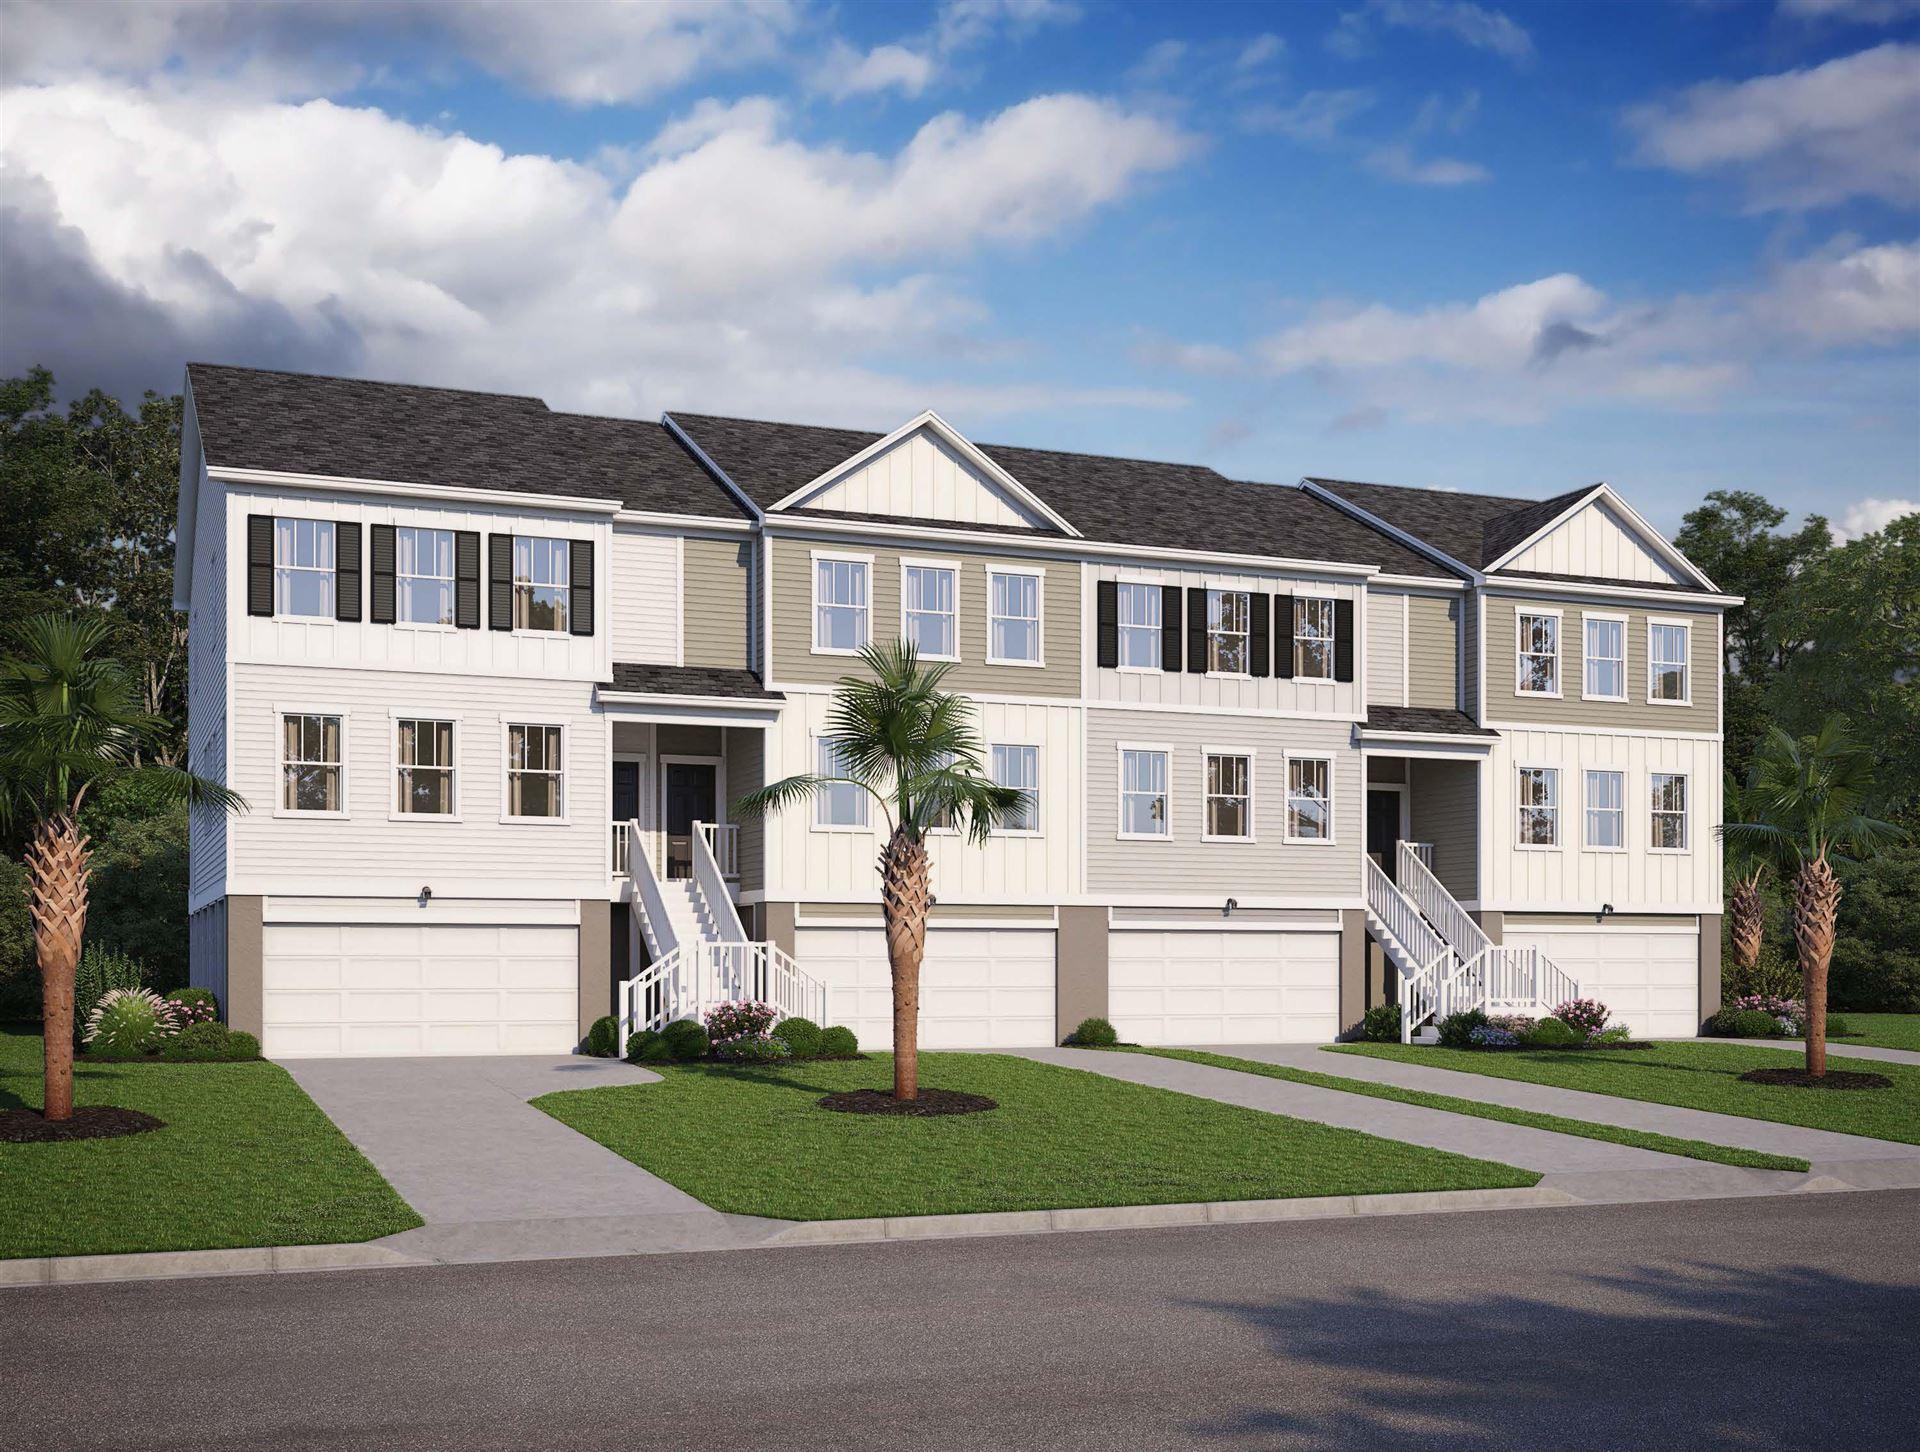 301 Lanyard Street, Johns Island, SC 29455 - MLS#: 20032870